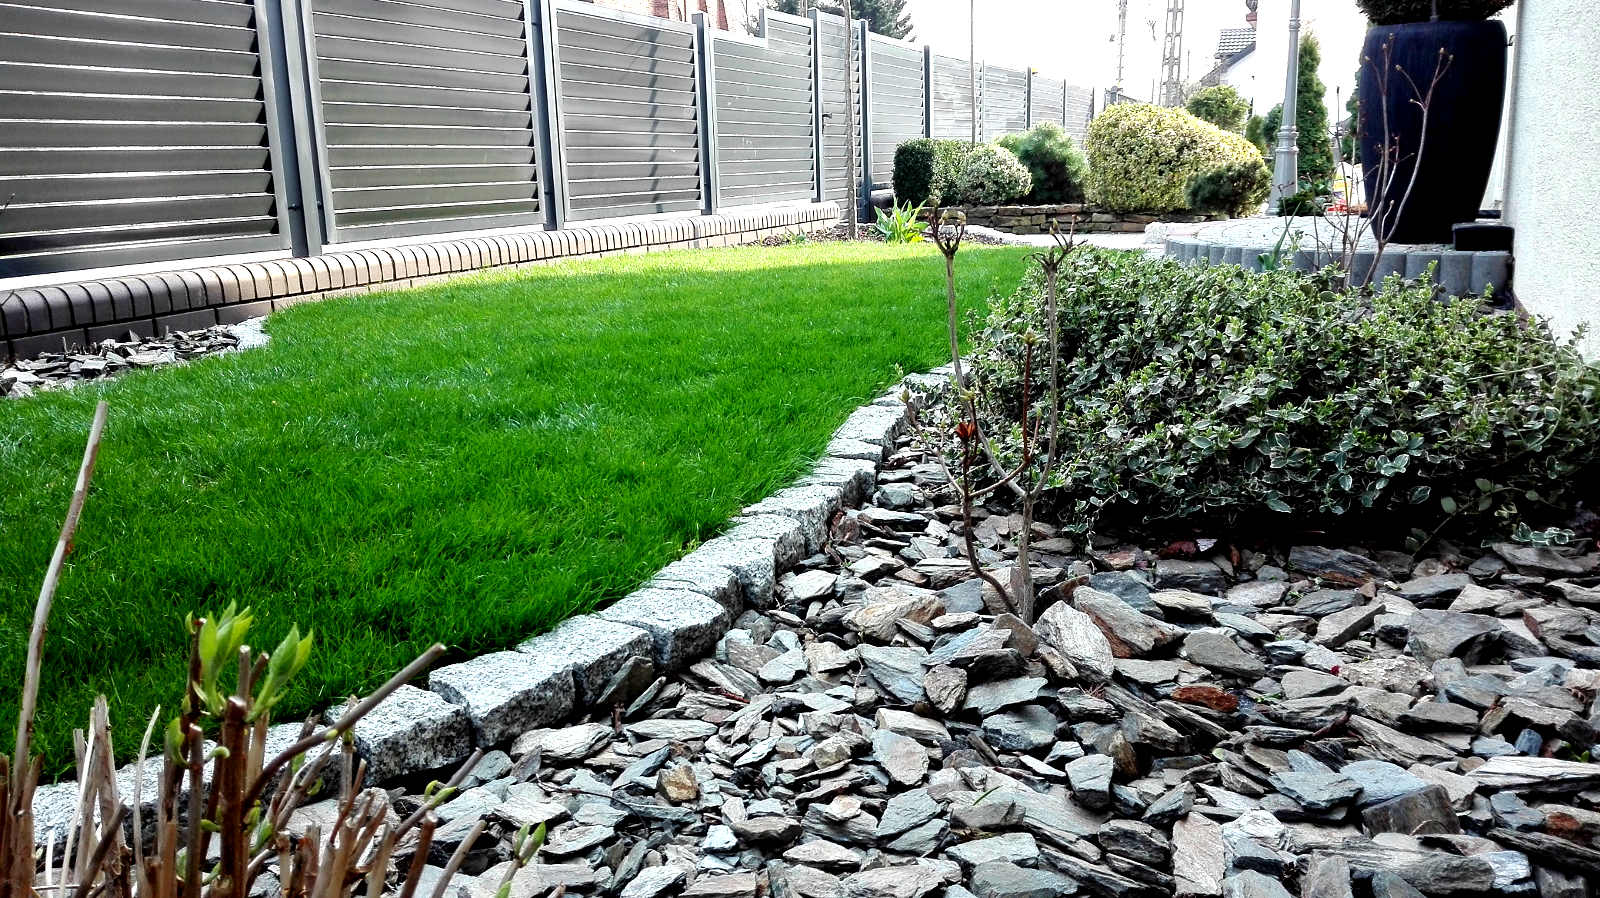 profesjonalne usługi ogrodnicze